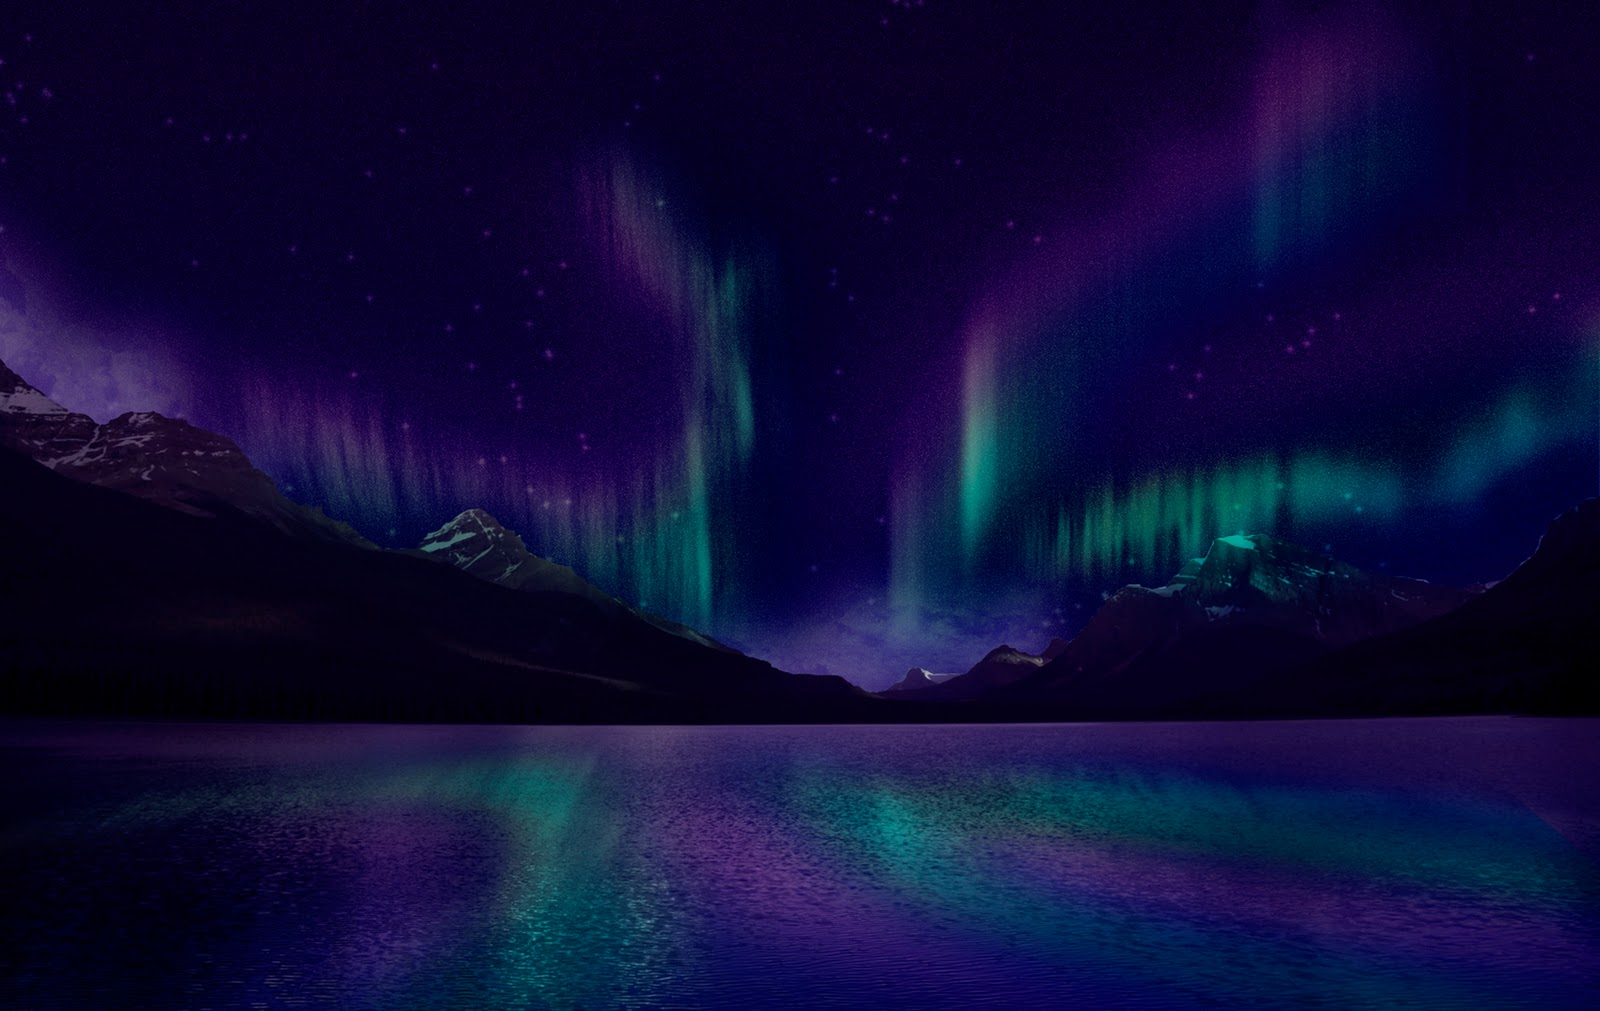 purple aurora borealis wallpapers x - photo #14